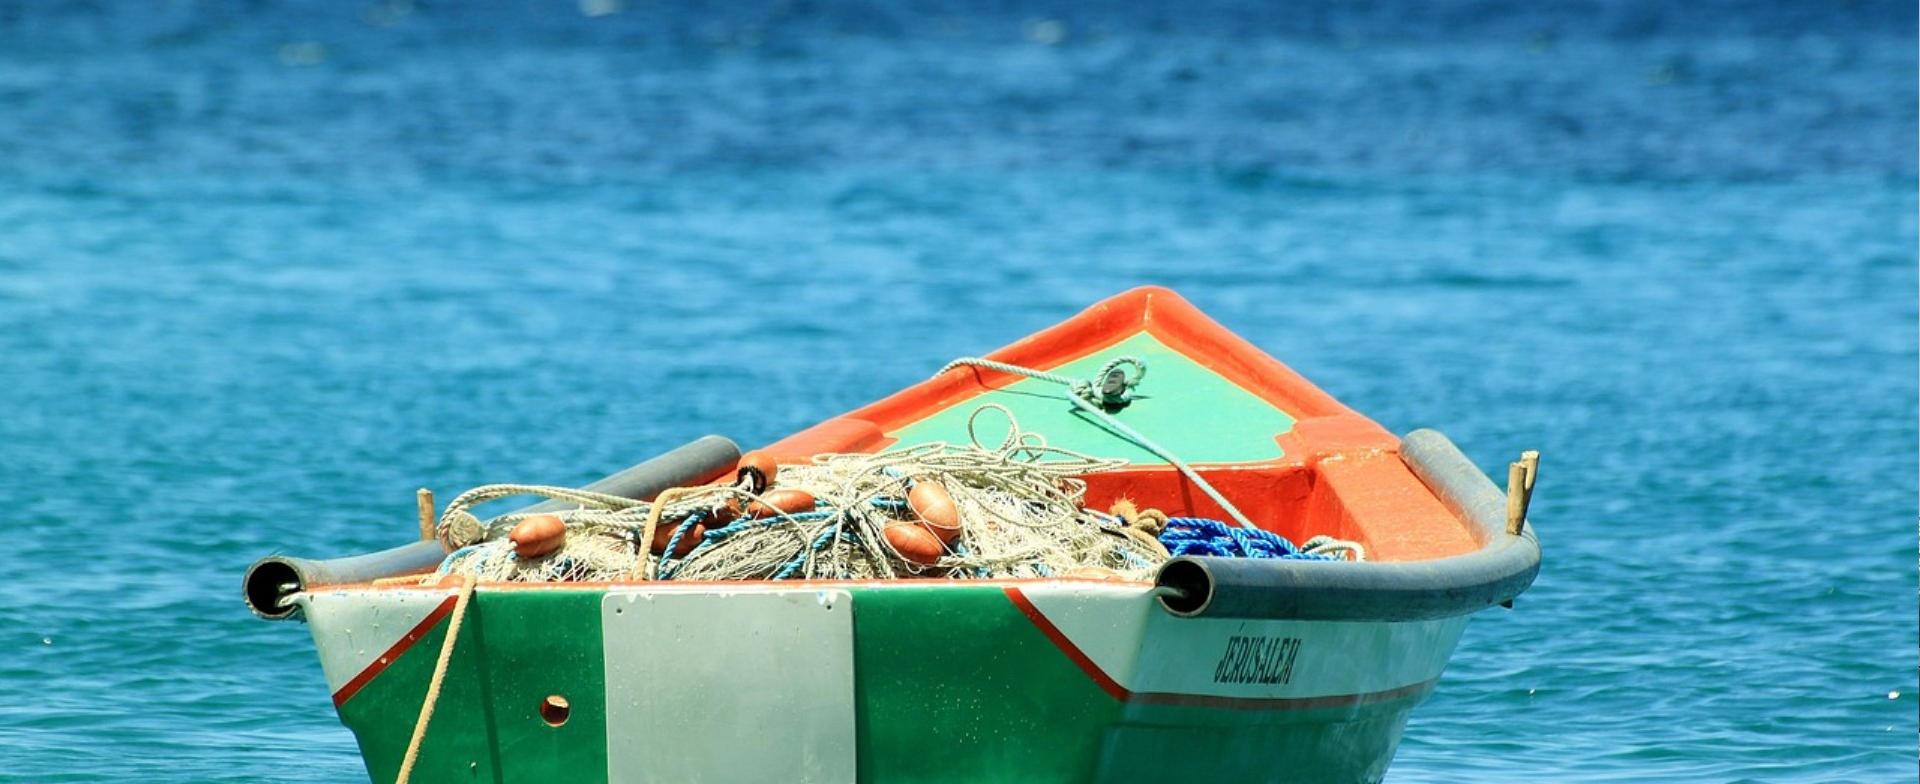 Kuba Cuba Havannah Antillen Südsee Karibi Malediven Nordsee Ostsee Holland Küste Dänemark Schweden Norwegen Finnland Skandinavien die reise reisen bielefeld reisebuero Wellnessreisen Familienreisen Kreuzfahrten Lastminute Mietwagen Lastminute